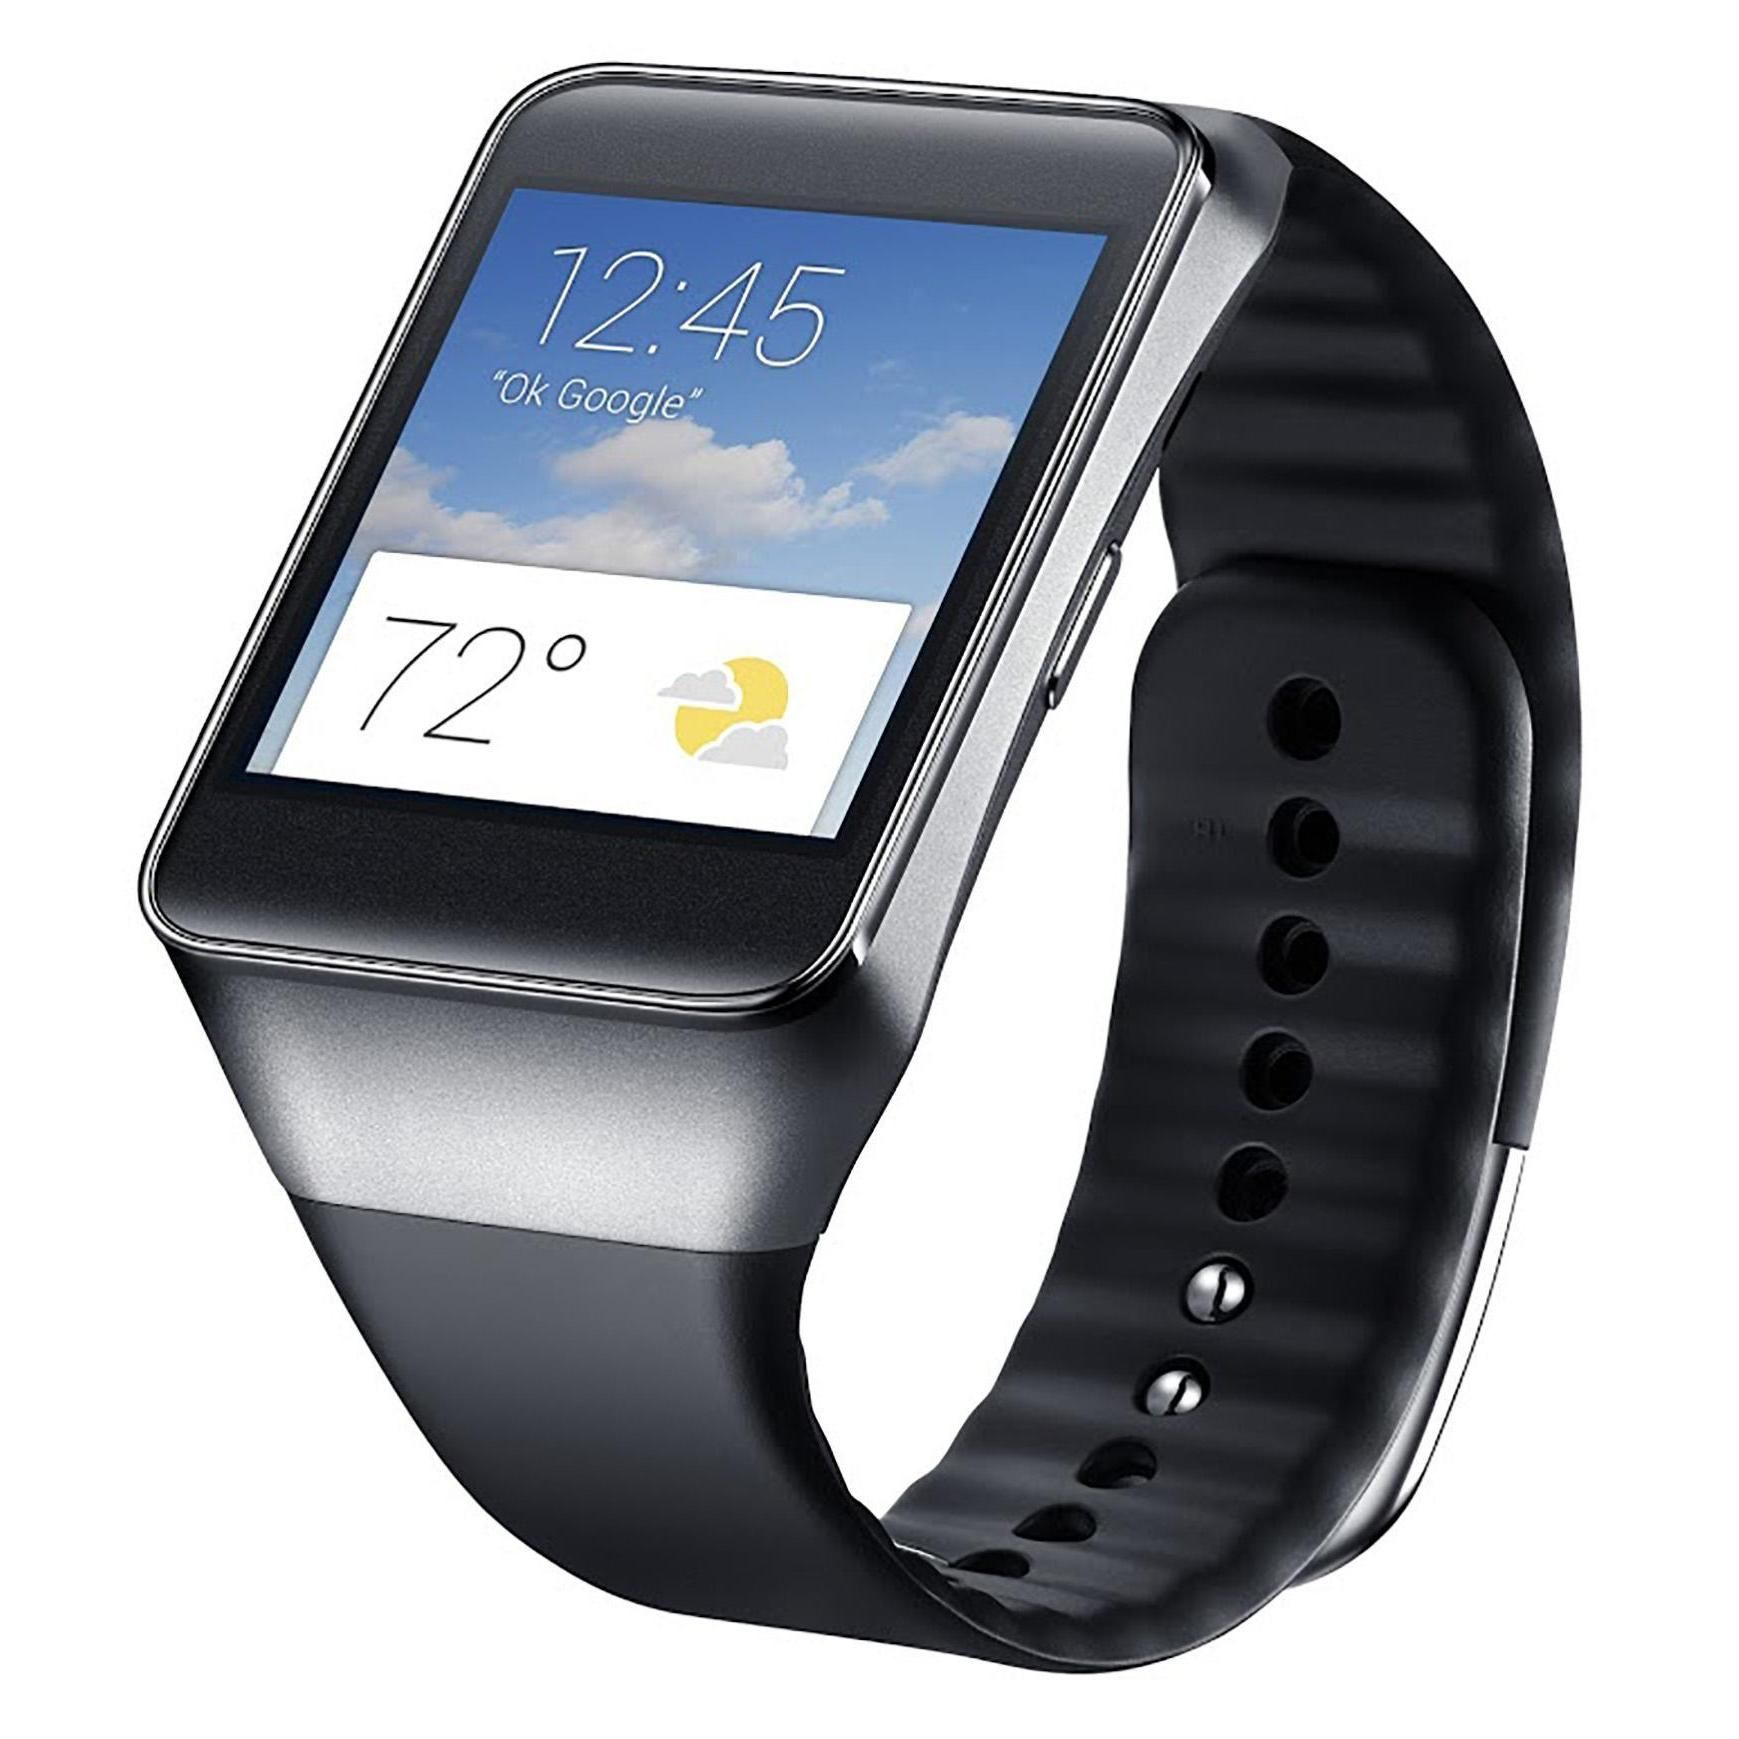 Shop For Samsung Galaxy Gear Live AMOLED Display Smart Watch